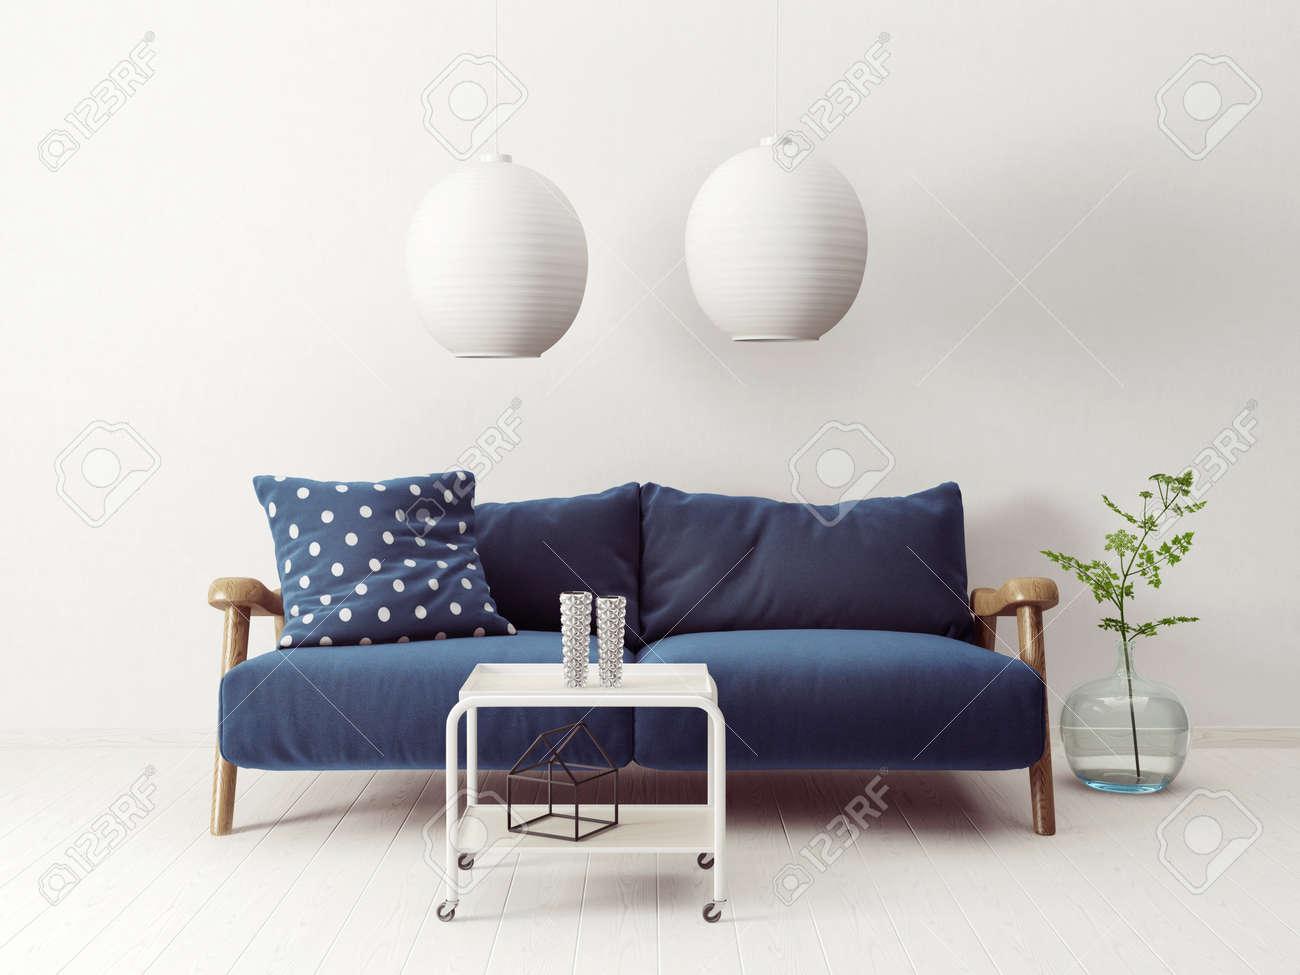 scandinavian living room furniture ideas fireplace tv modern interior sofa in 3d render illustration